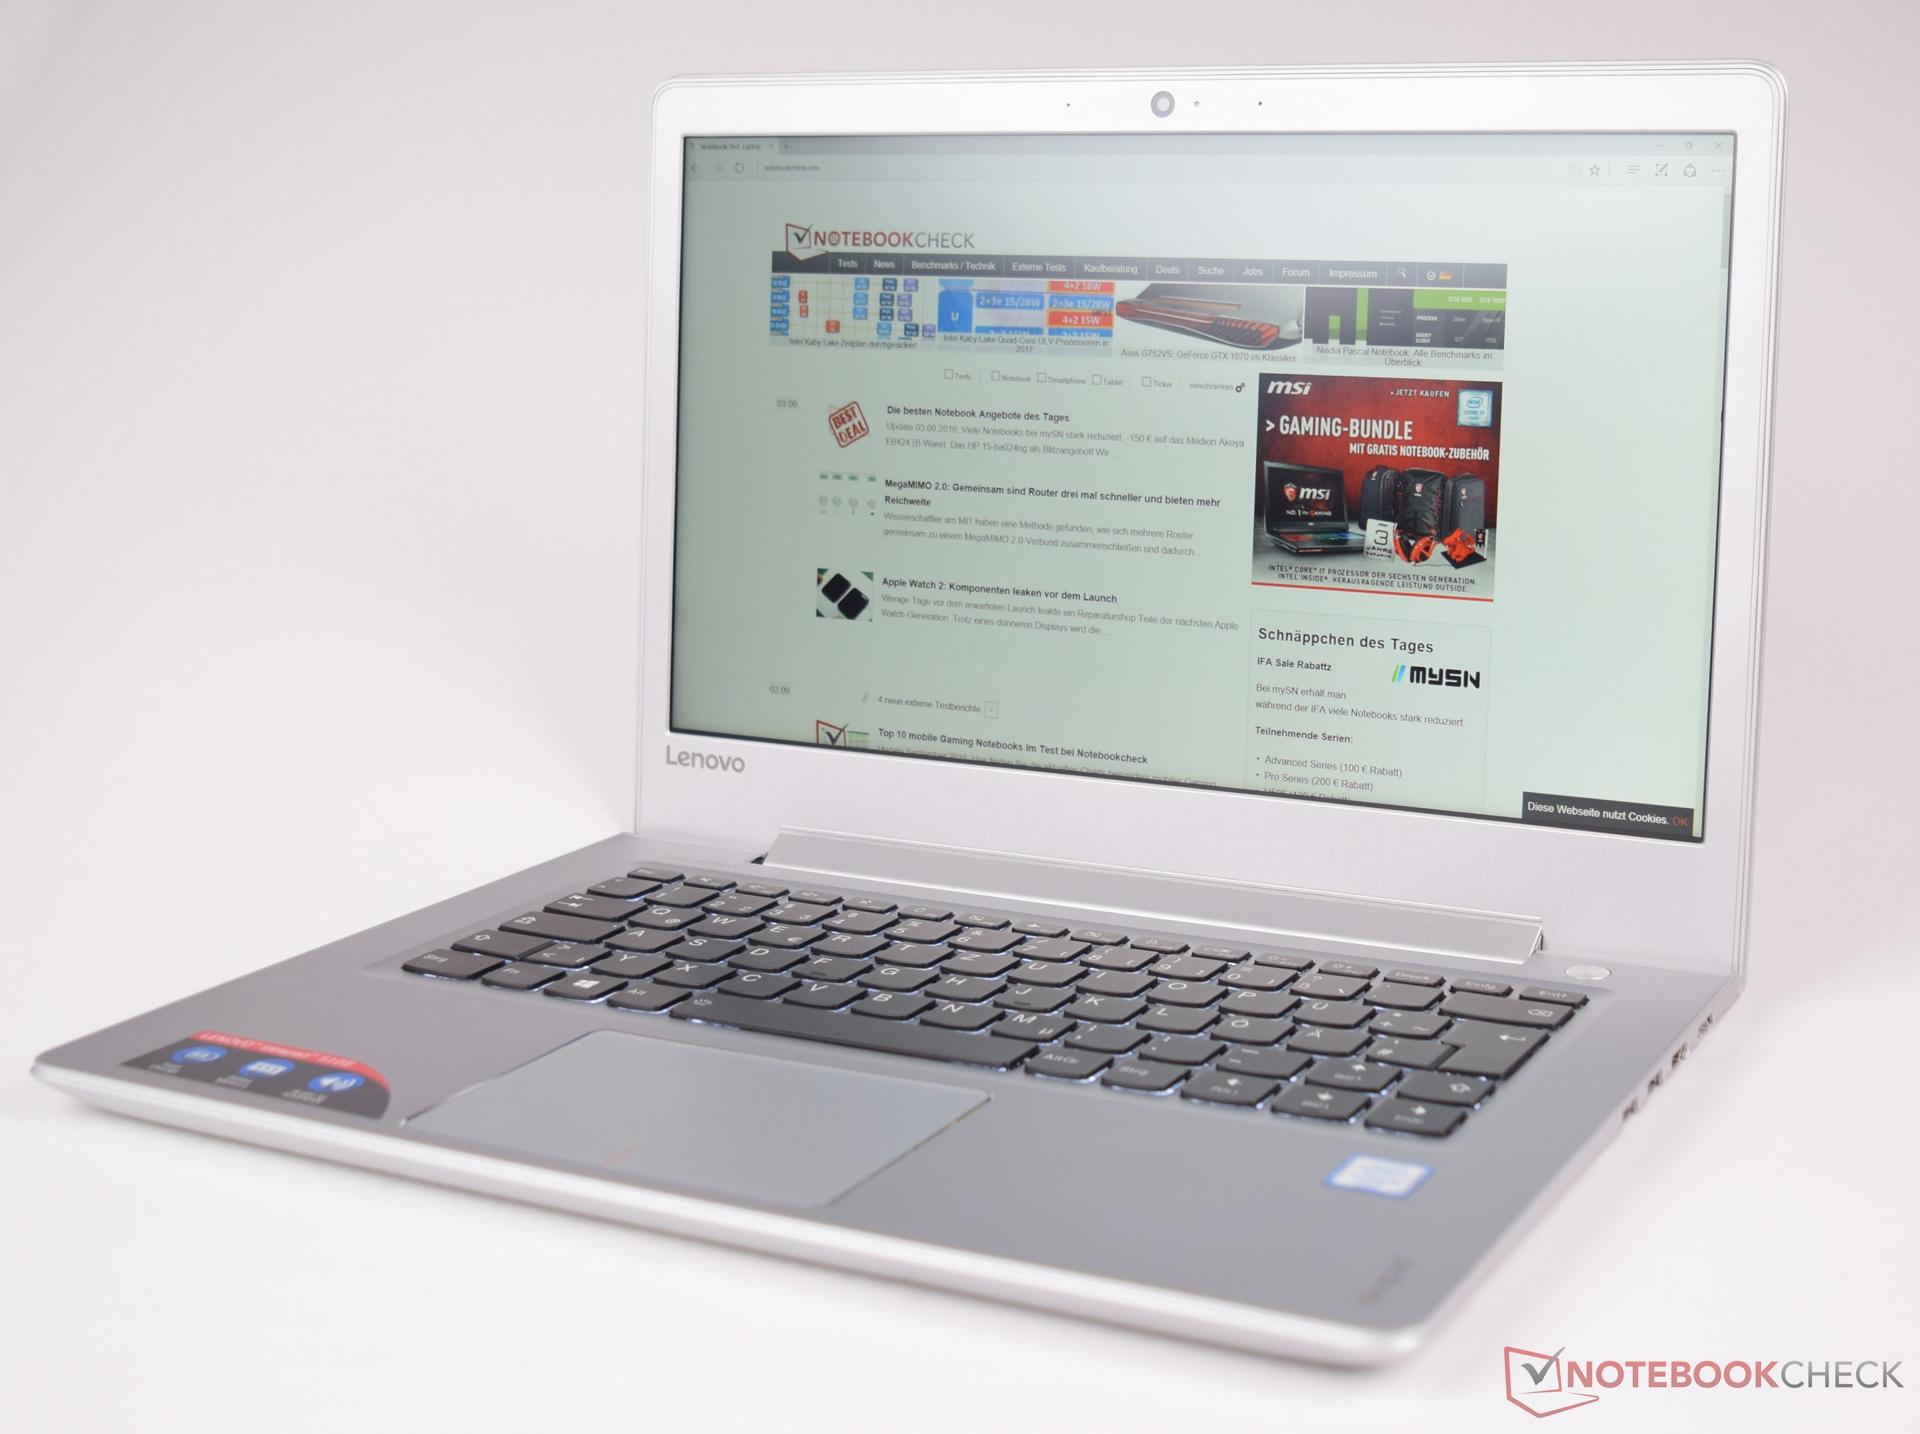 NEW case For lenovo IdeaPad 500s 15ISK 500S 15 series